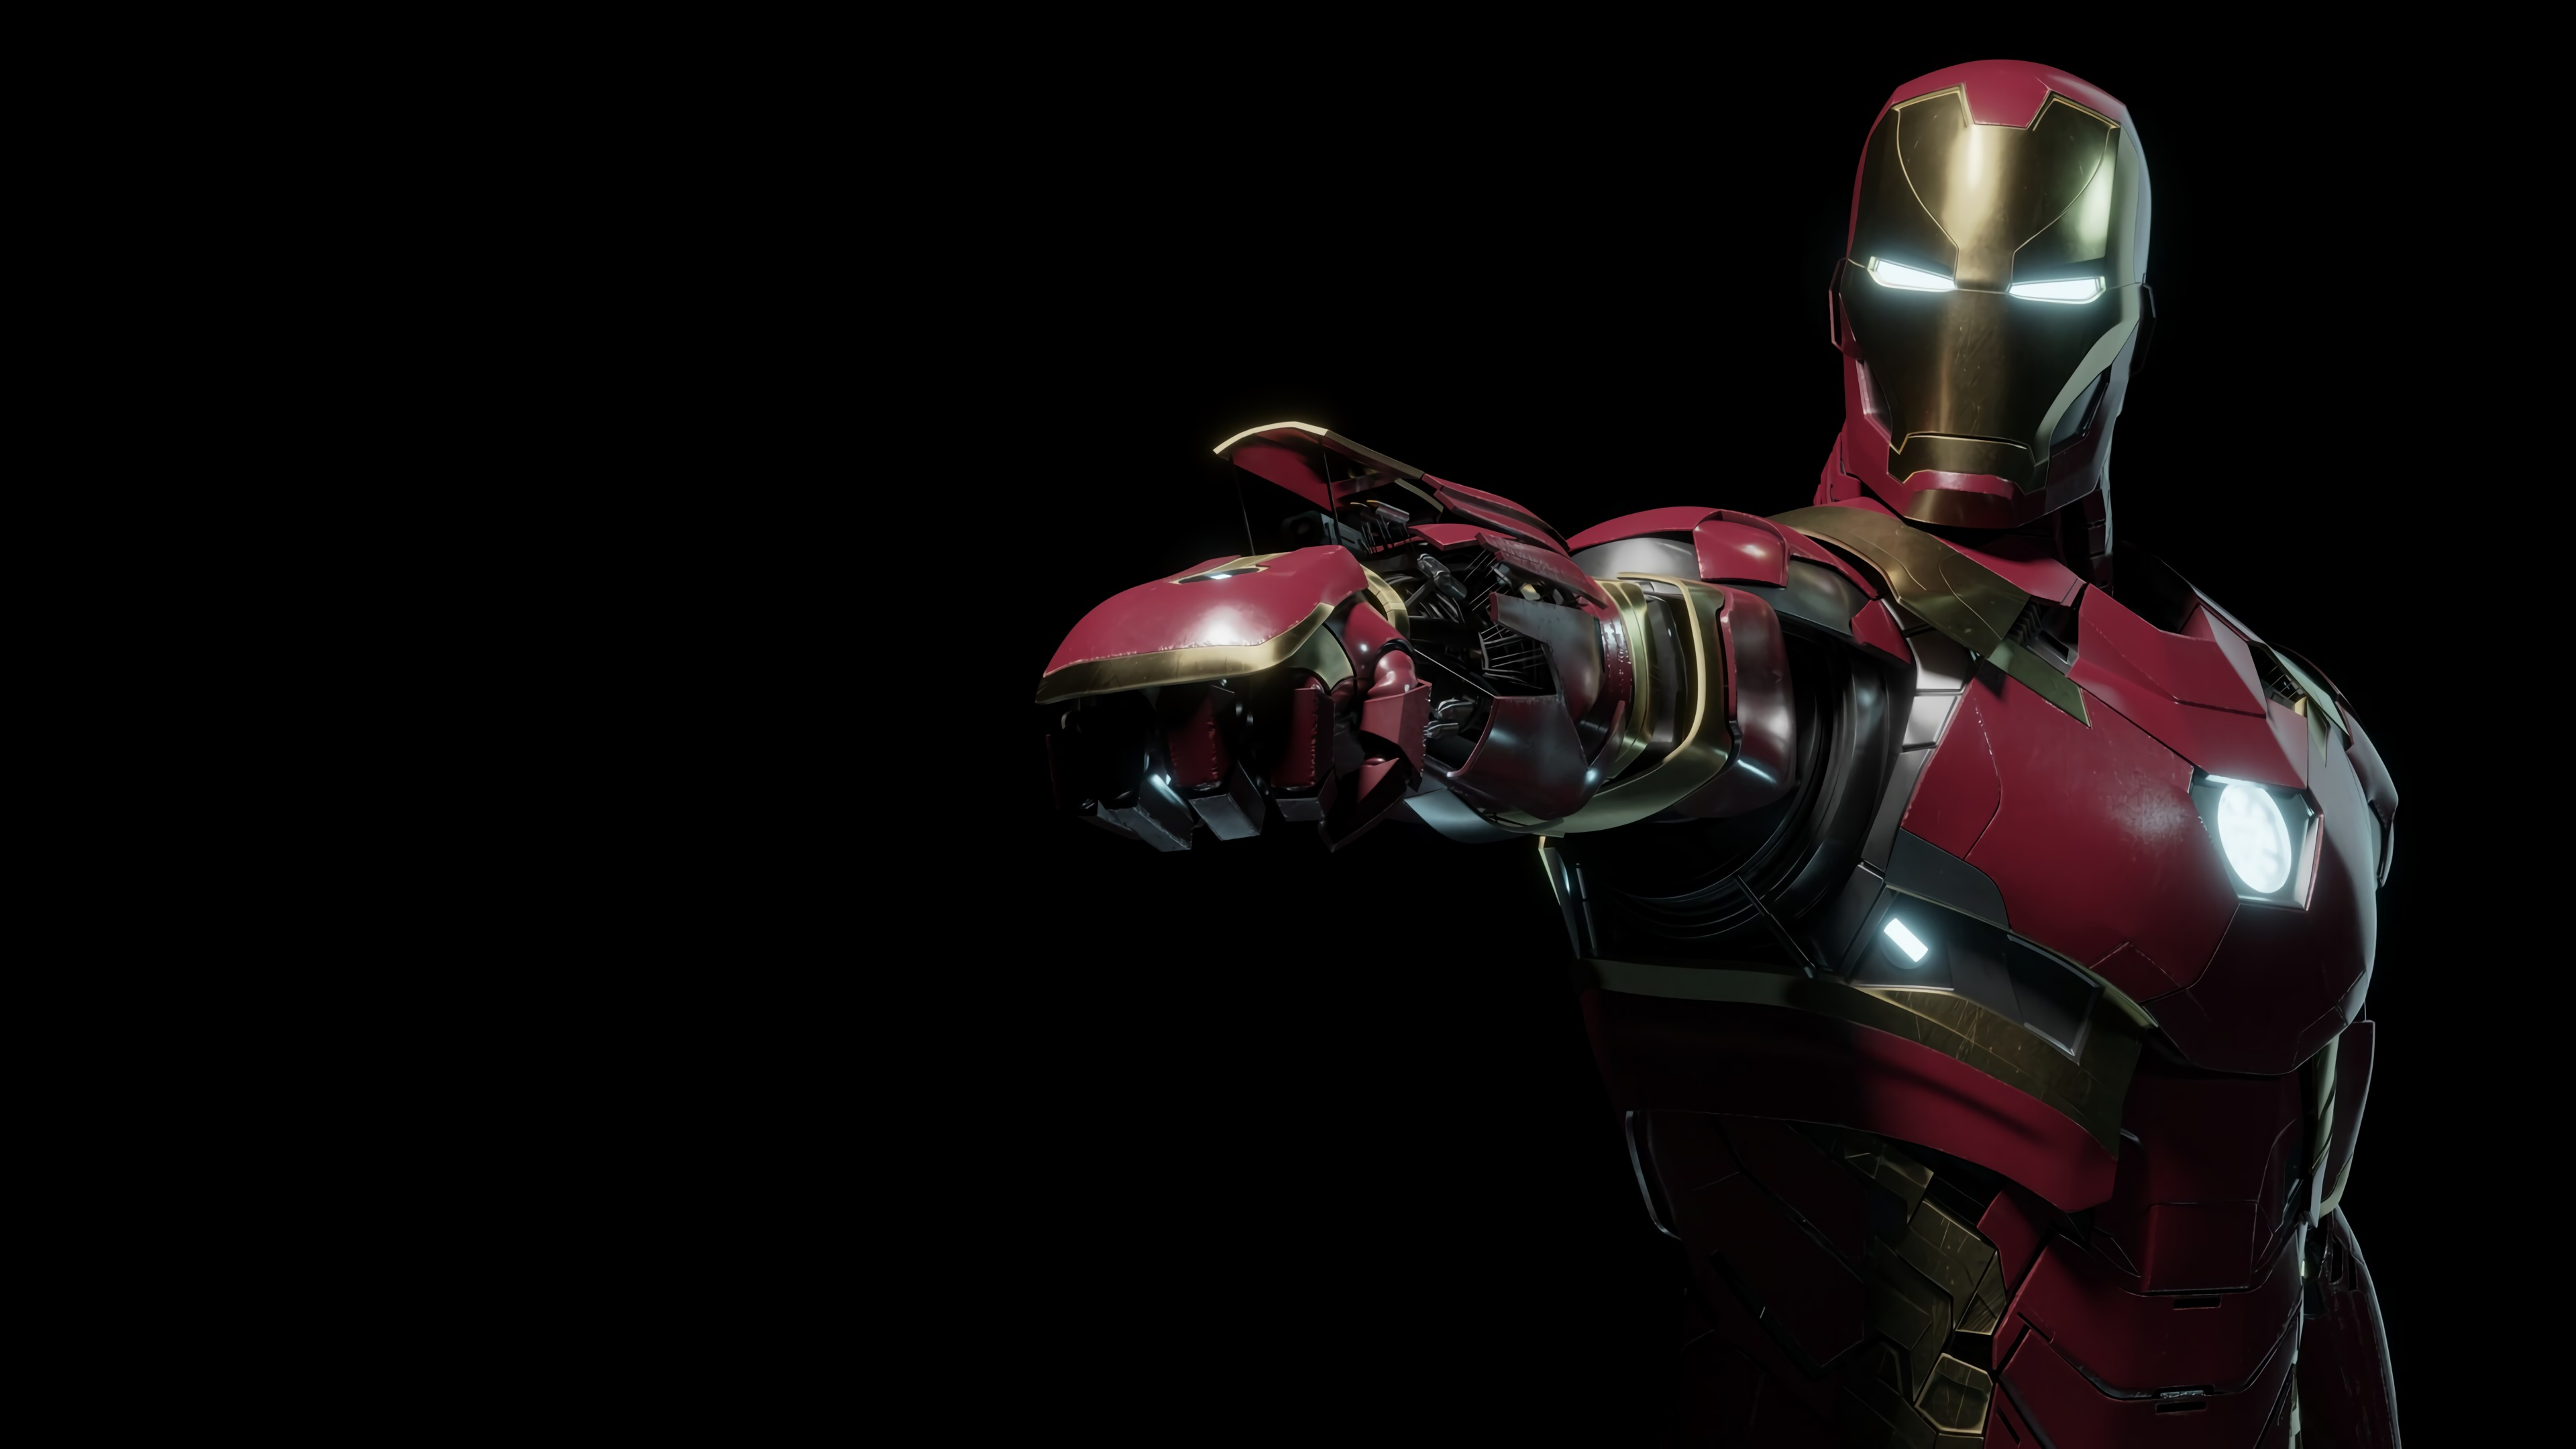 new iron man cgi 1568054358 - New Iron Man Cgi - superheroes wallpapers, iron man wallpapers, hd-wallpapers, digital art wallpapers, artwork wallpapers, artstation wallpapers, 4k-wallpapers